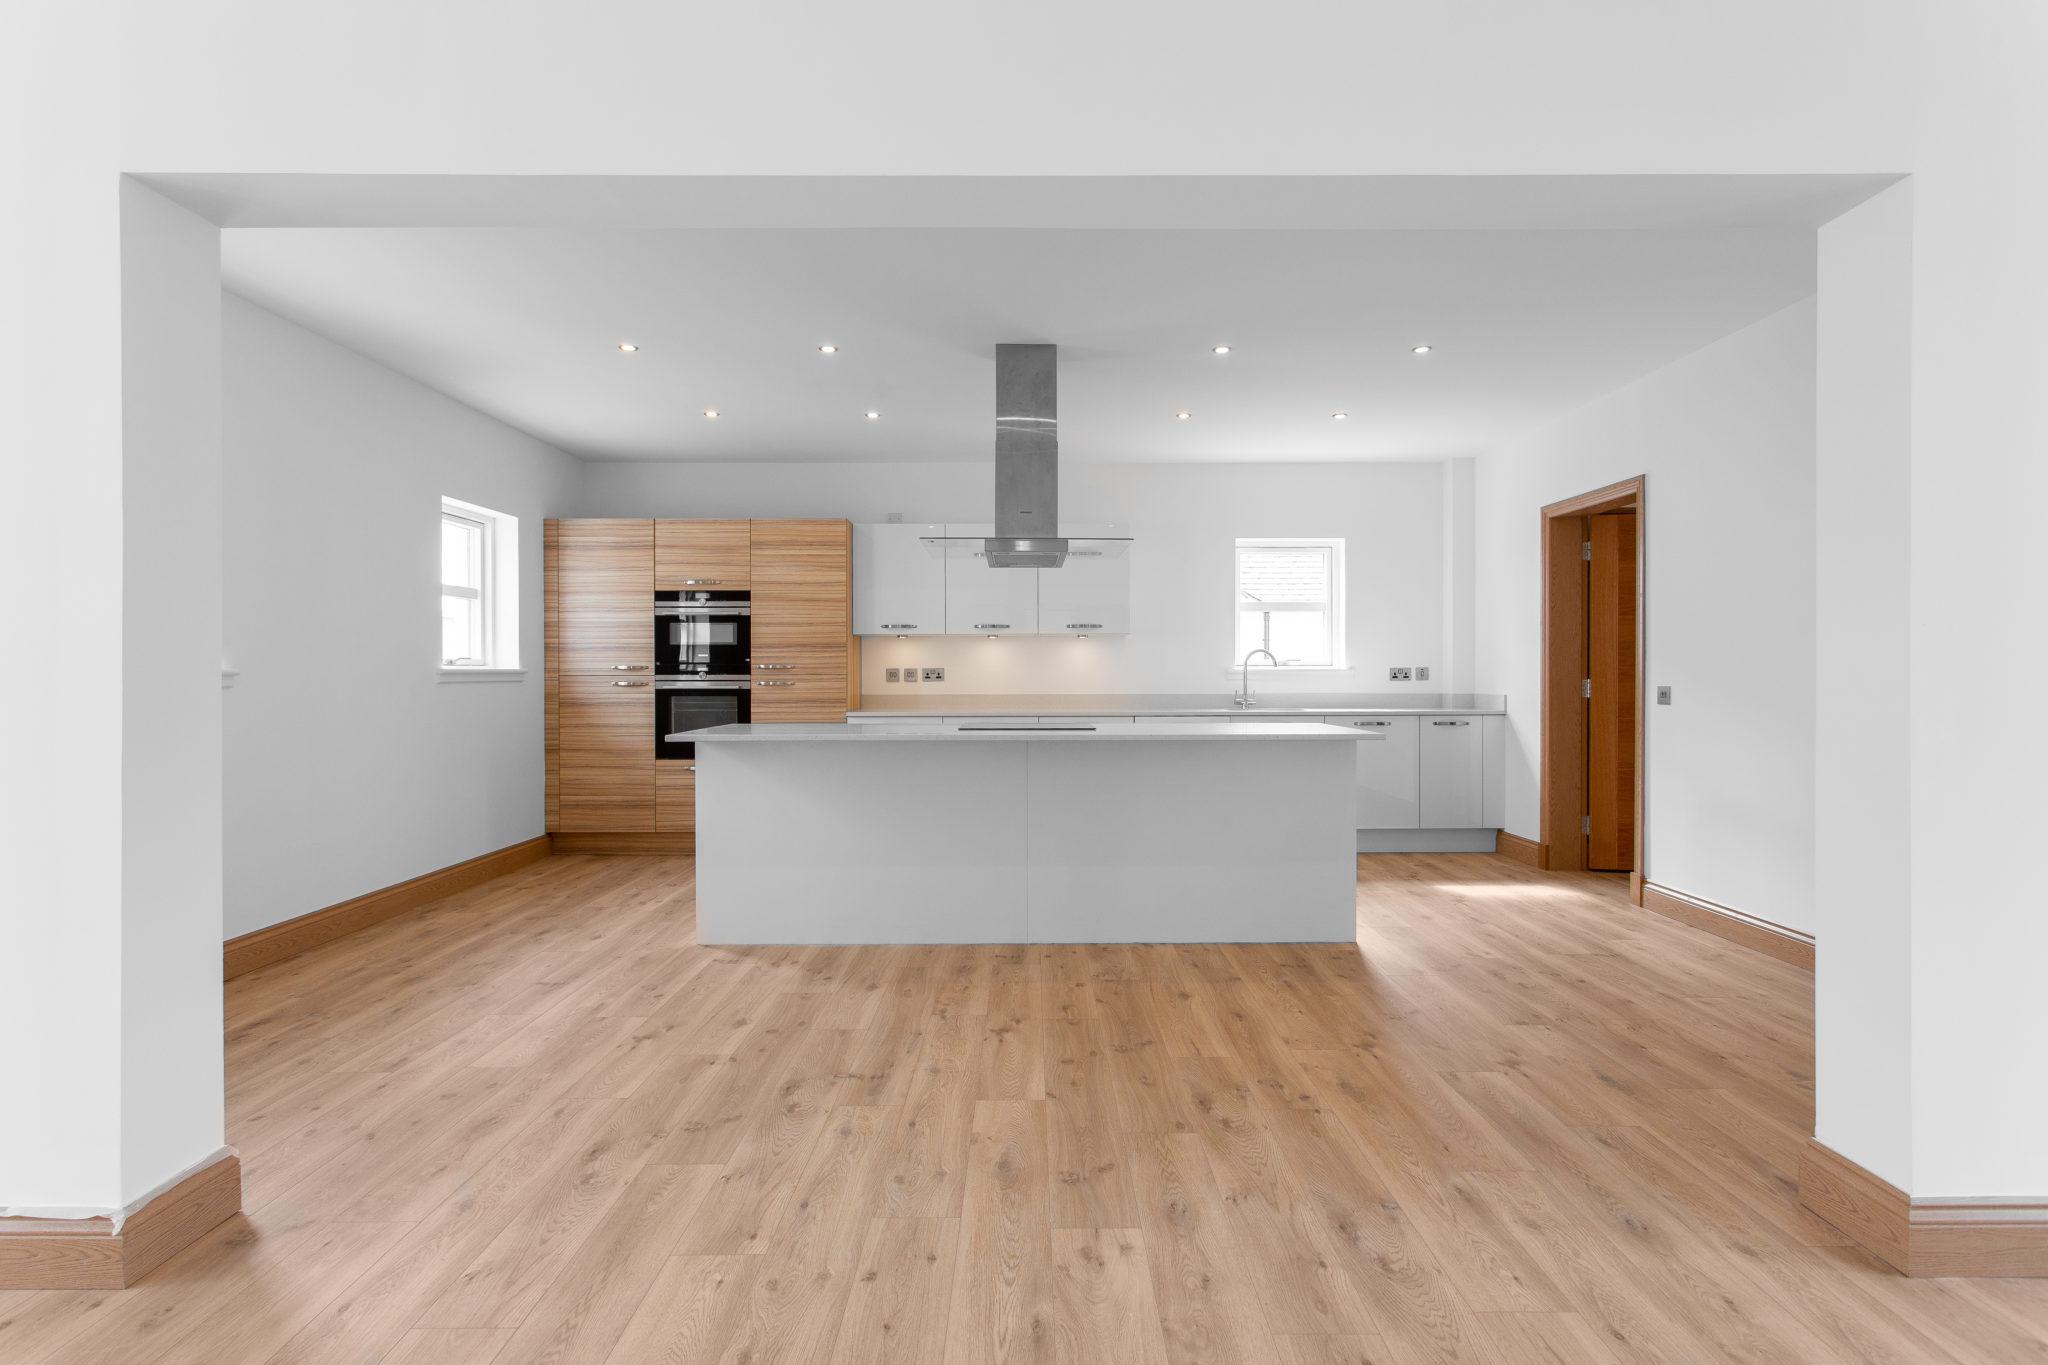 Kitchen Interior Shoot